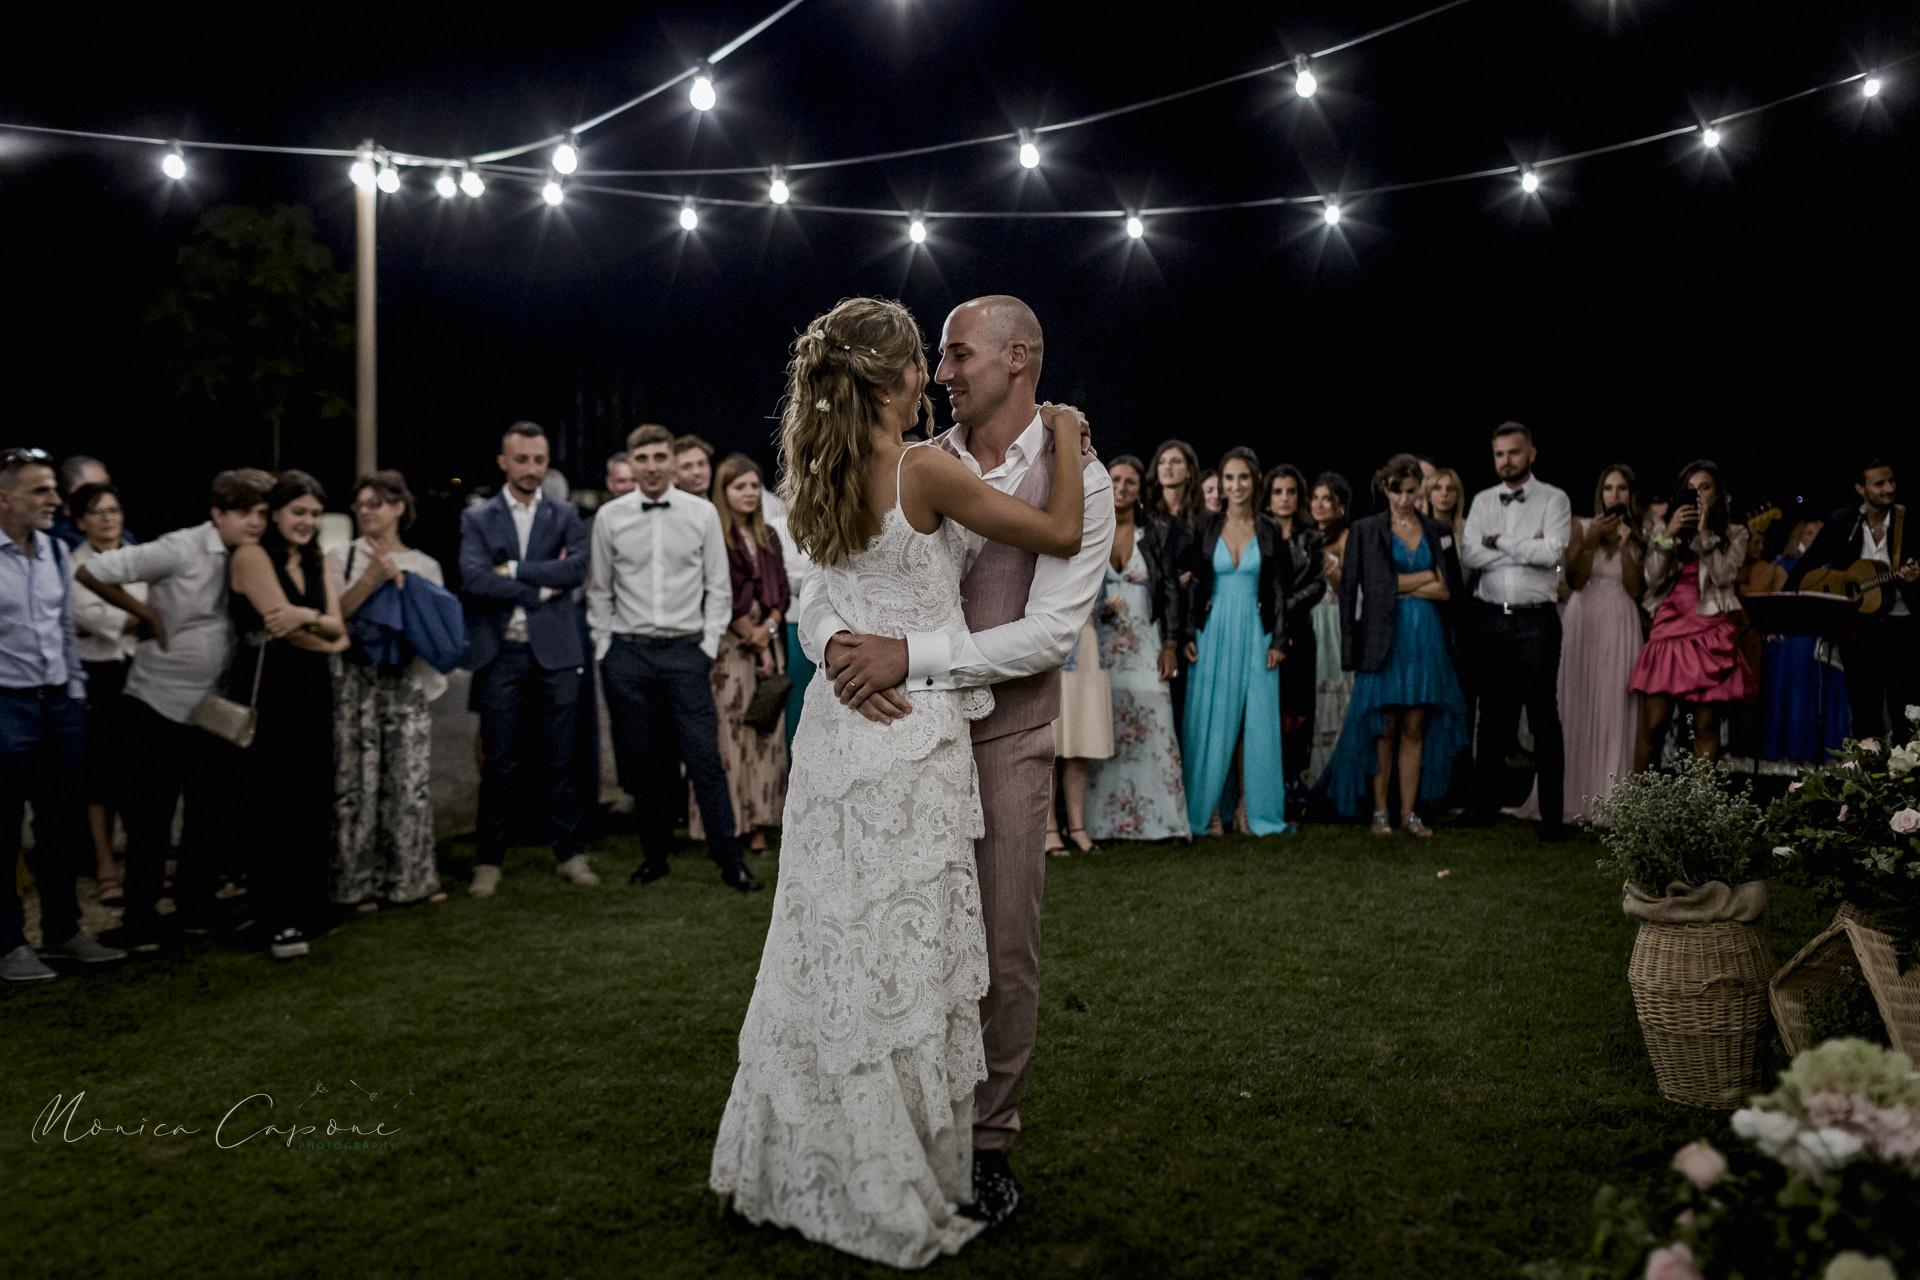 matrimonio-stile-reportage-in-toscana